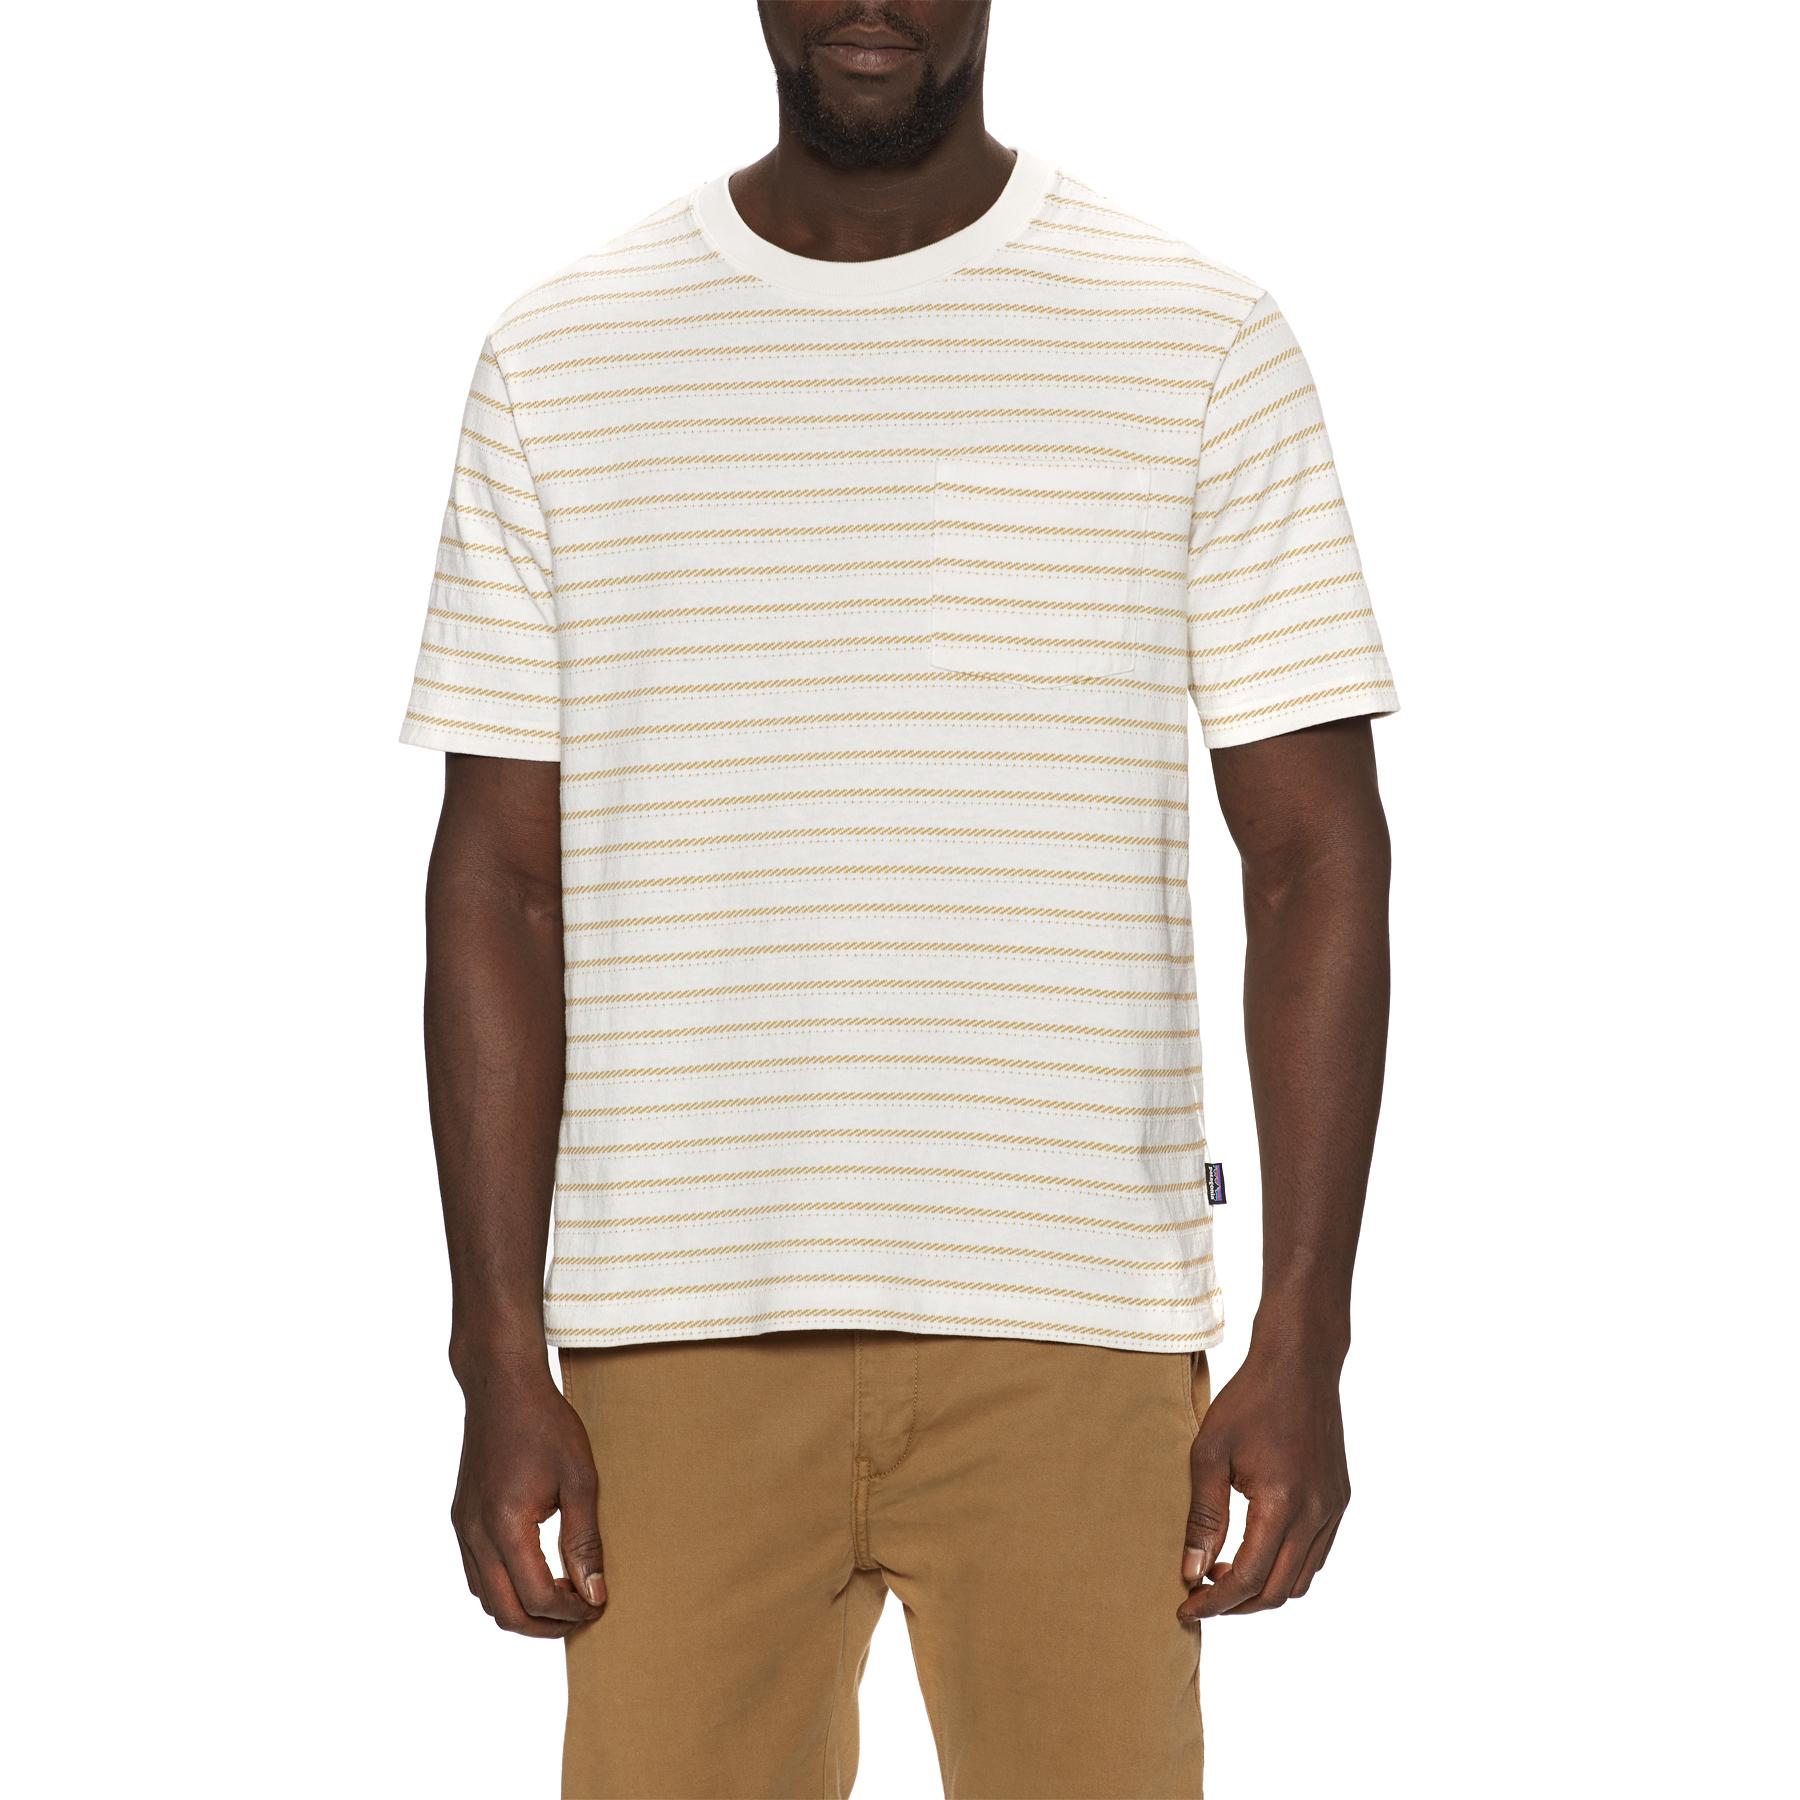 Patagonia Organic Cotton Midweight Pocket Mens Short Sleeve T-Shirt - Birch White